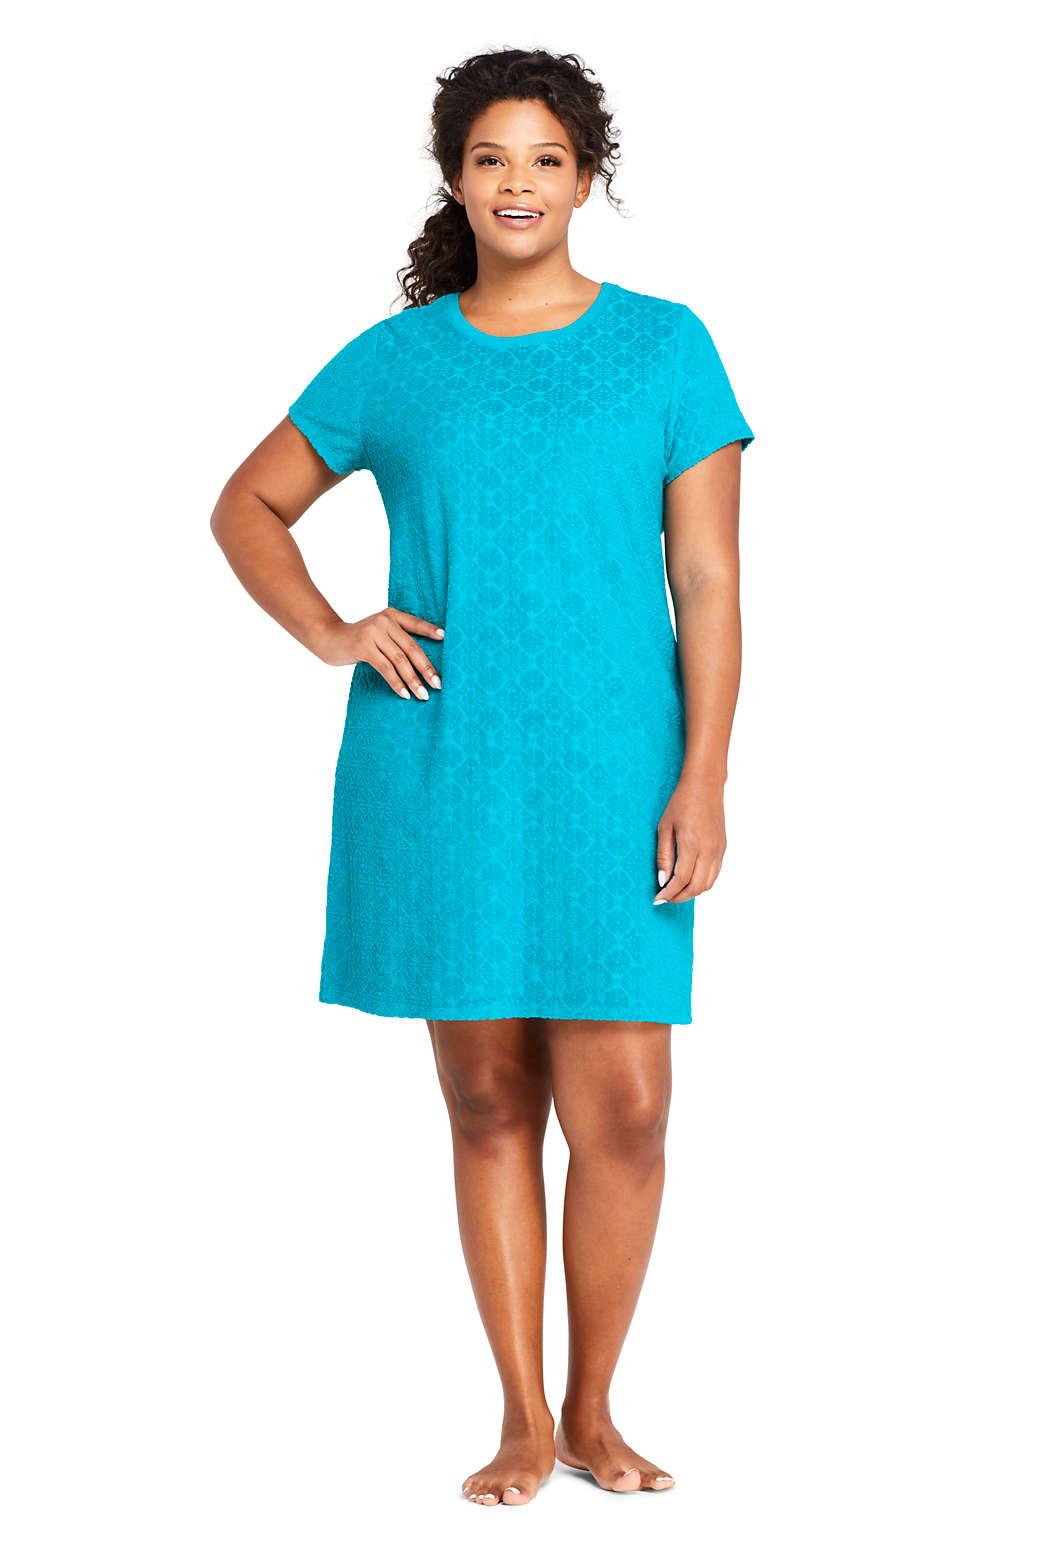 62c7b6e7ad1ea Plus Size Swim Dress Cover Up